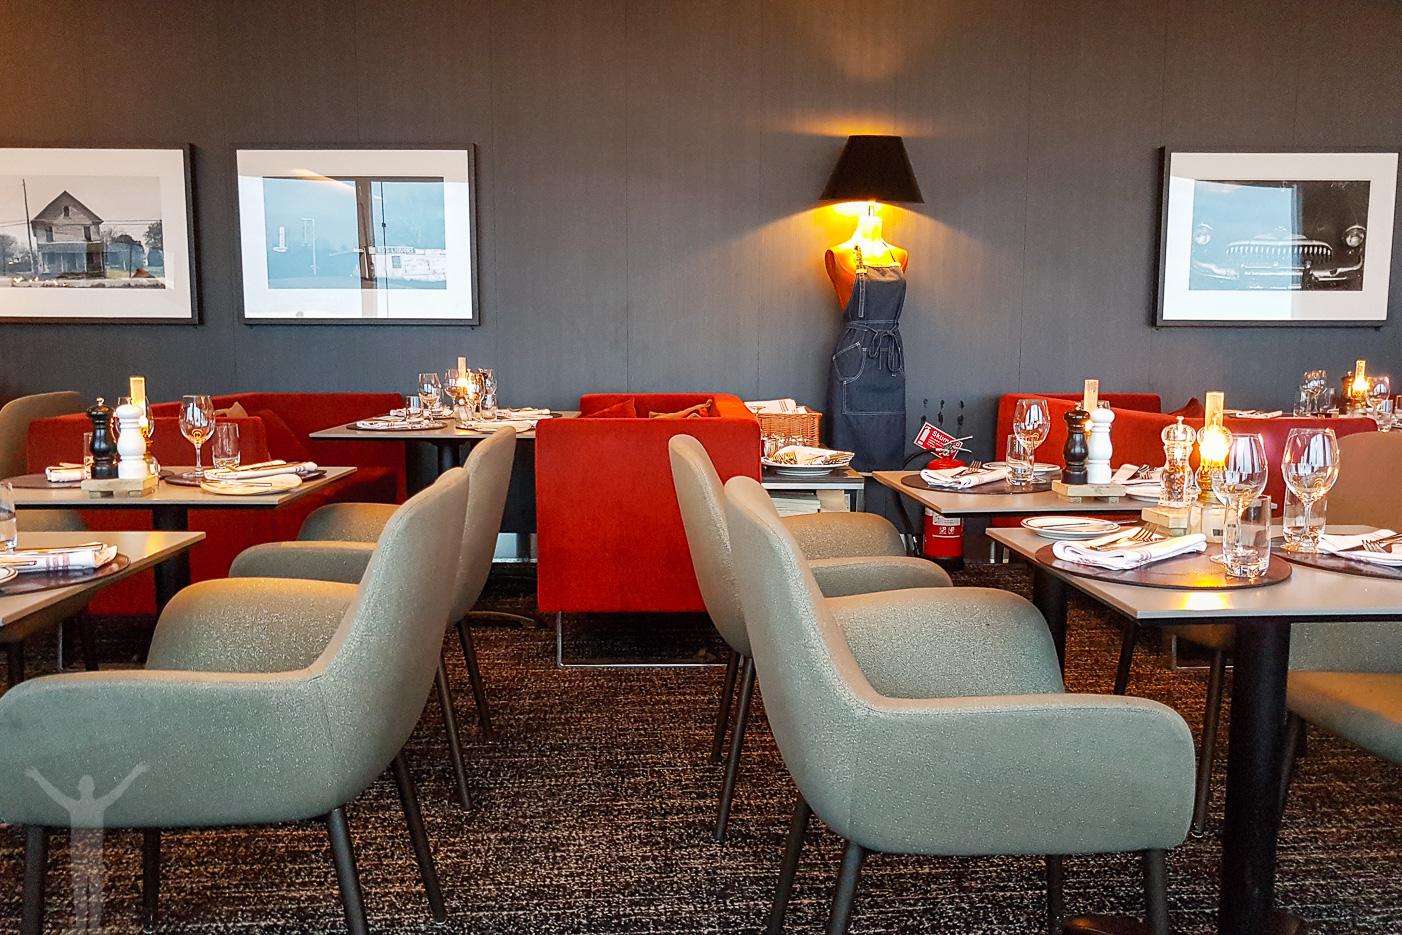 Kitchen & Table Arlanda